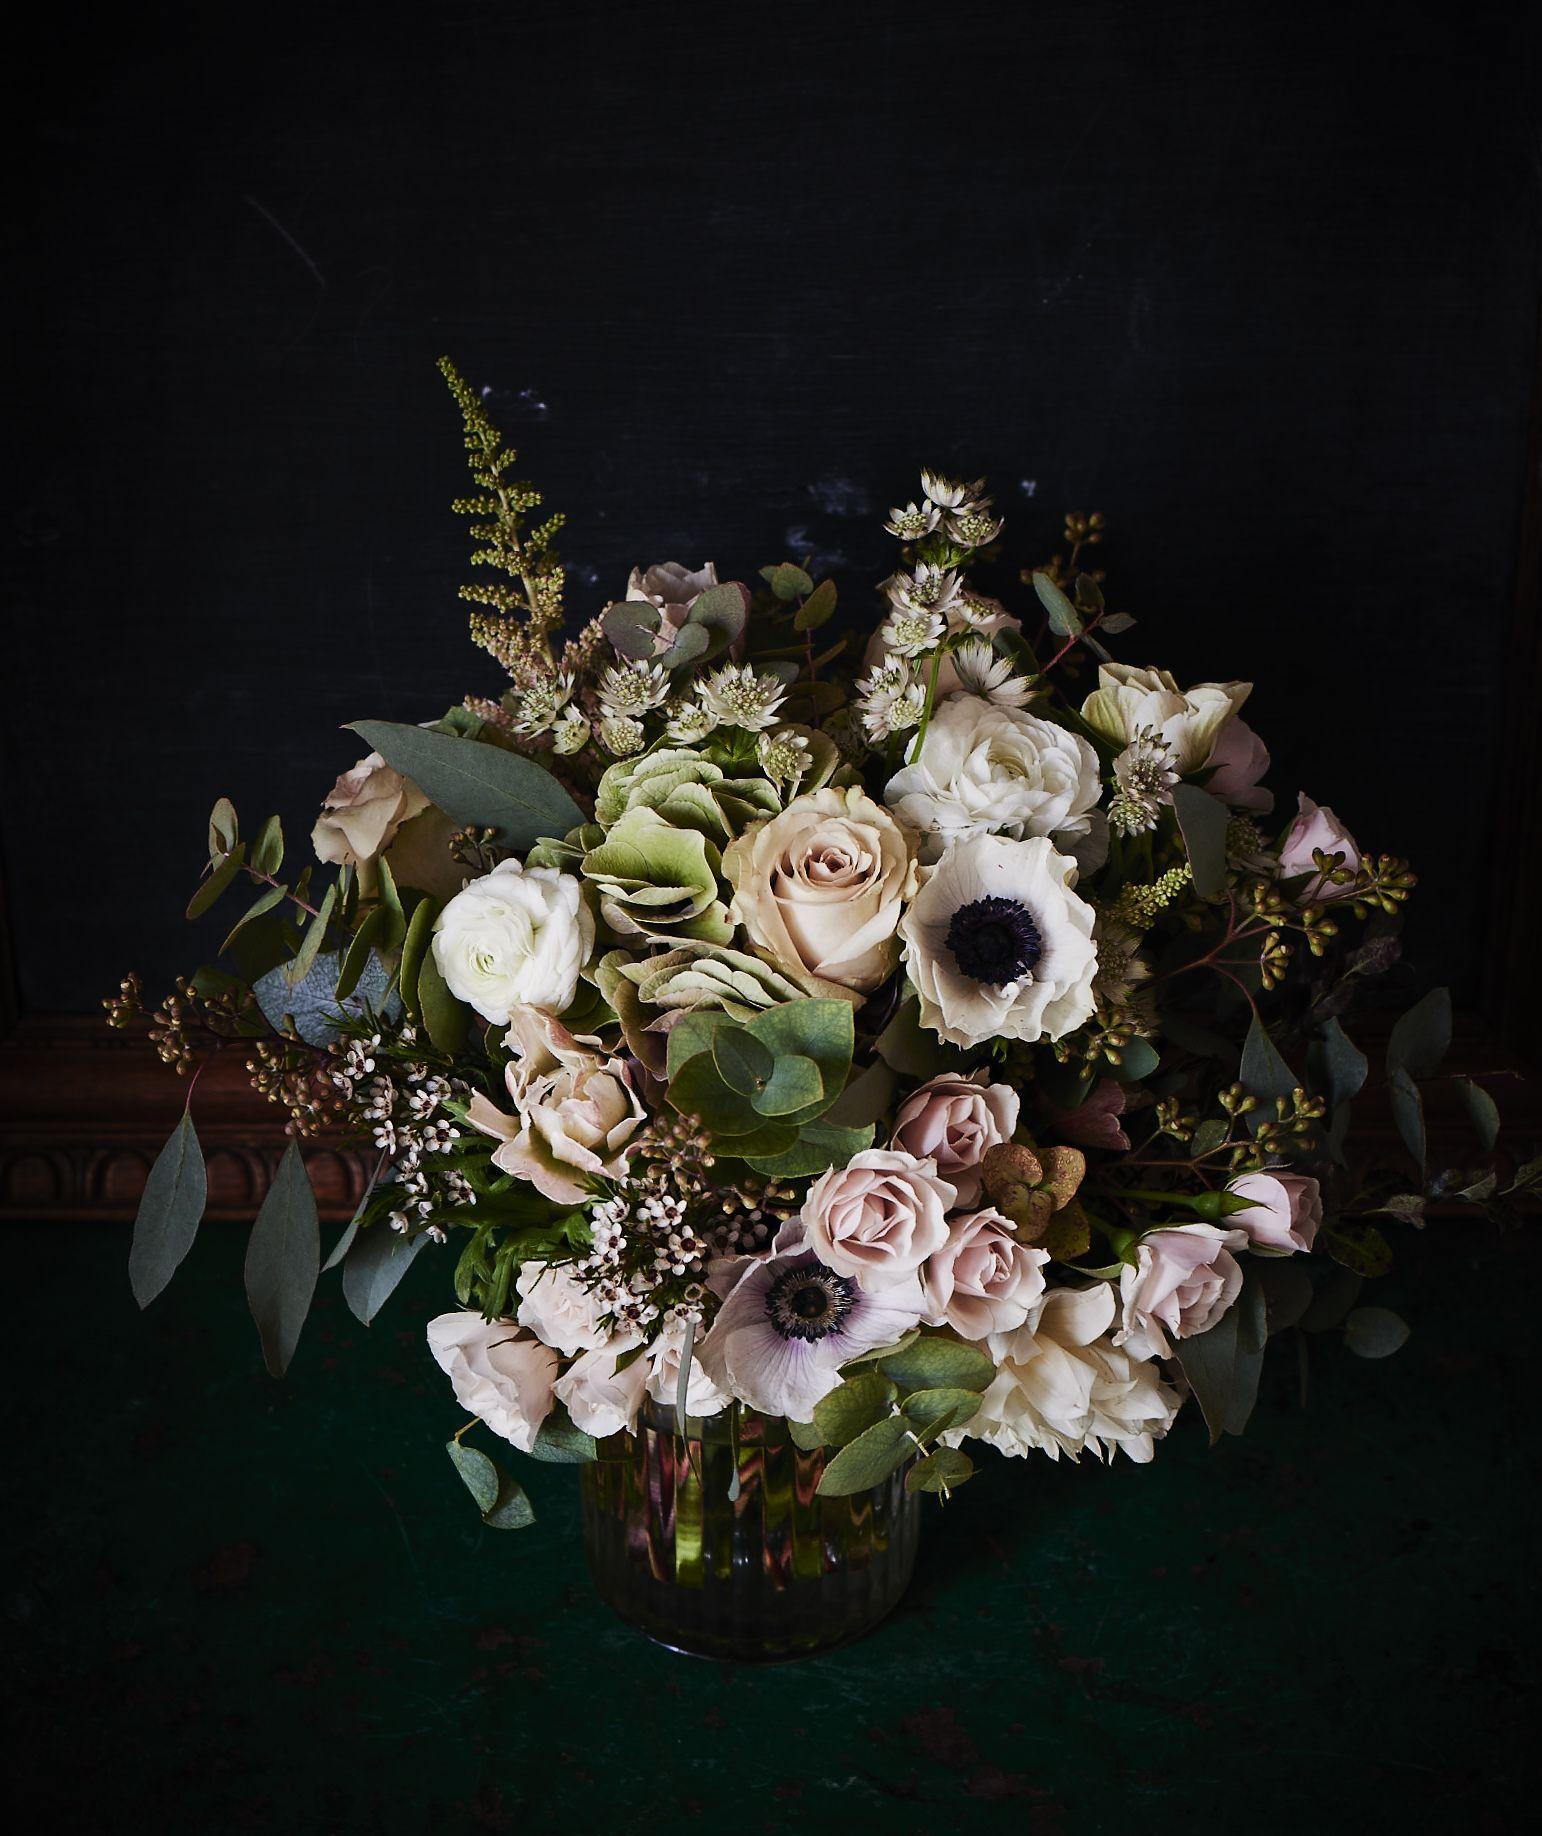 flowers on black background Flower arrangements, Flower